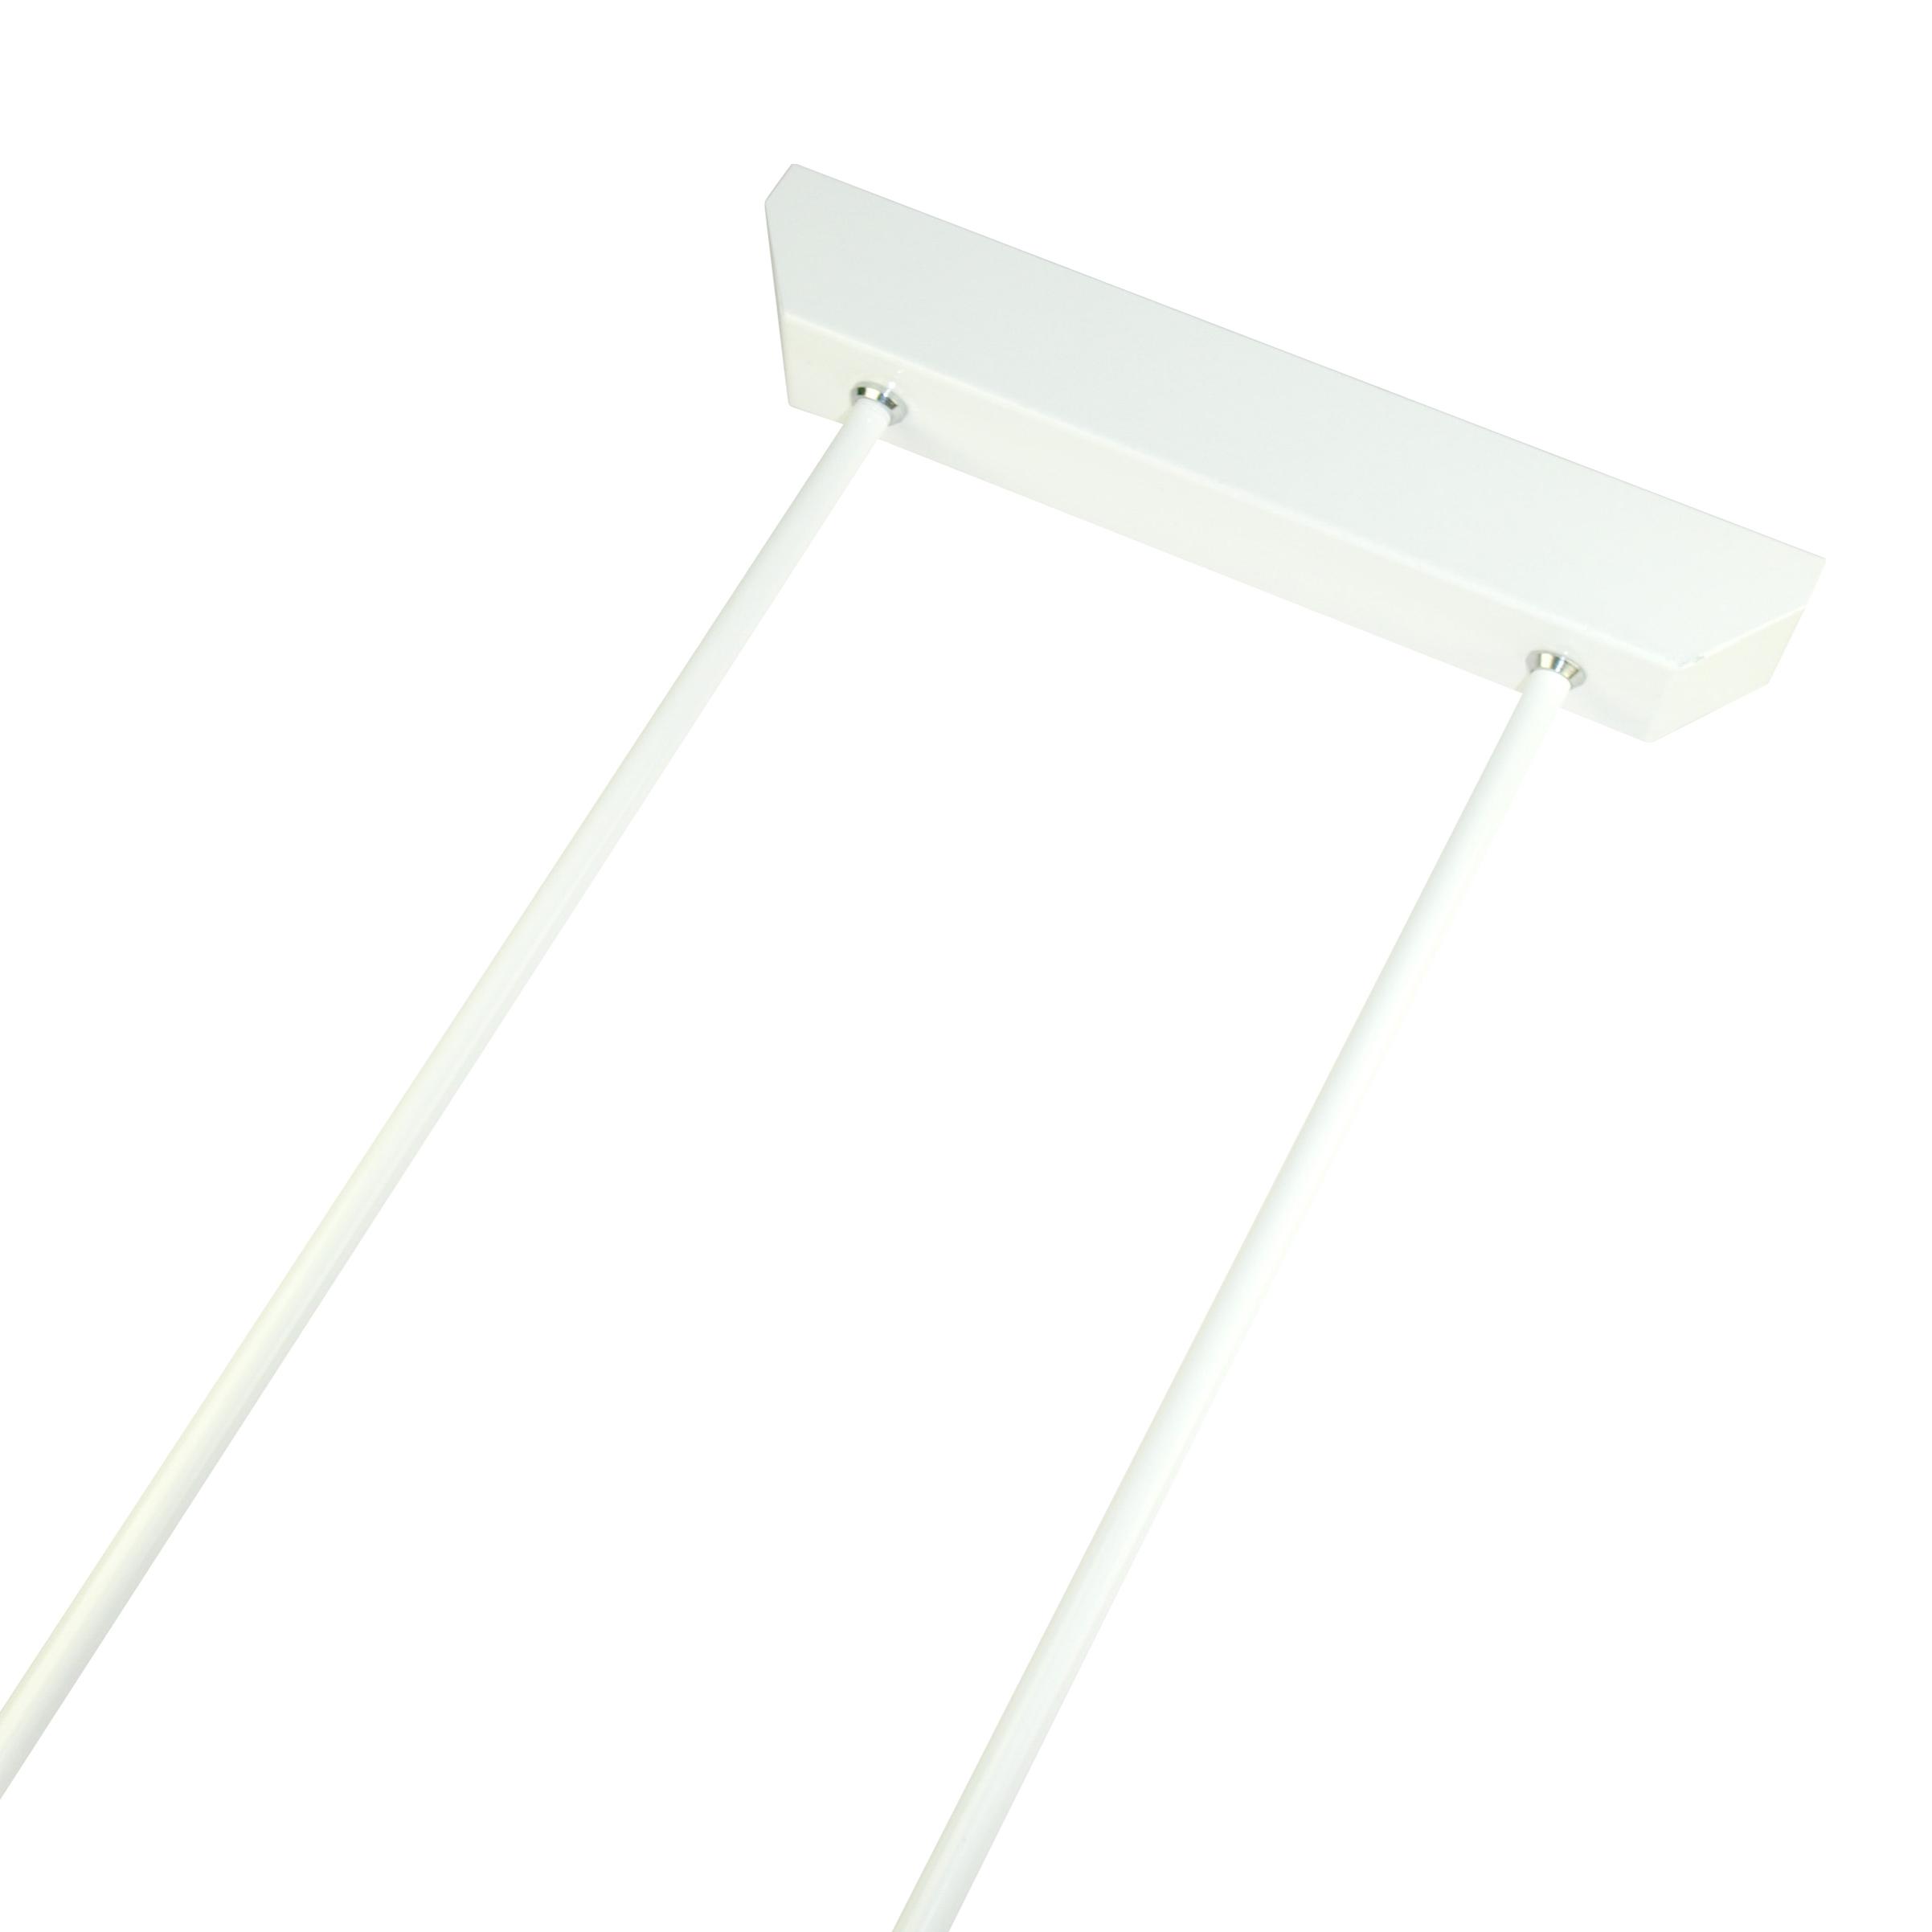 Design-Pendelpaar 500mm weiß verdrahtet